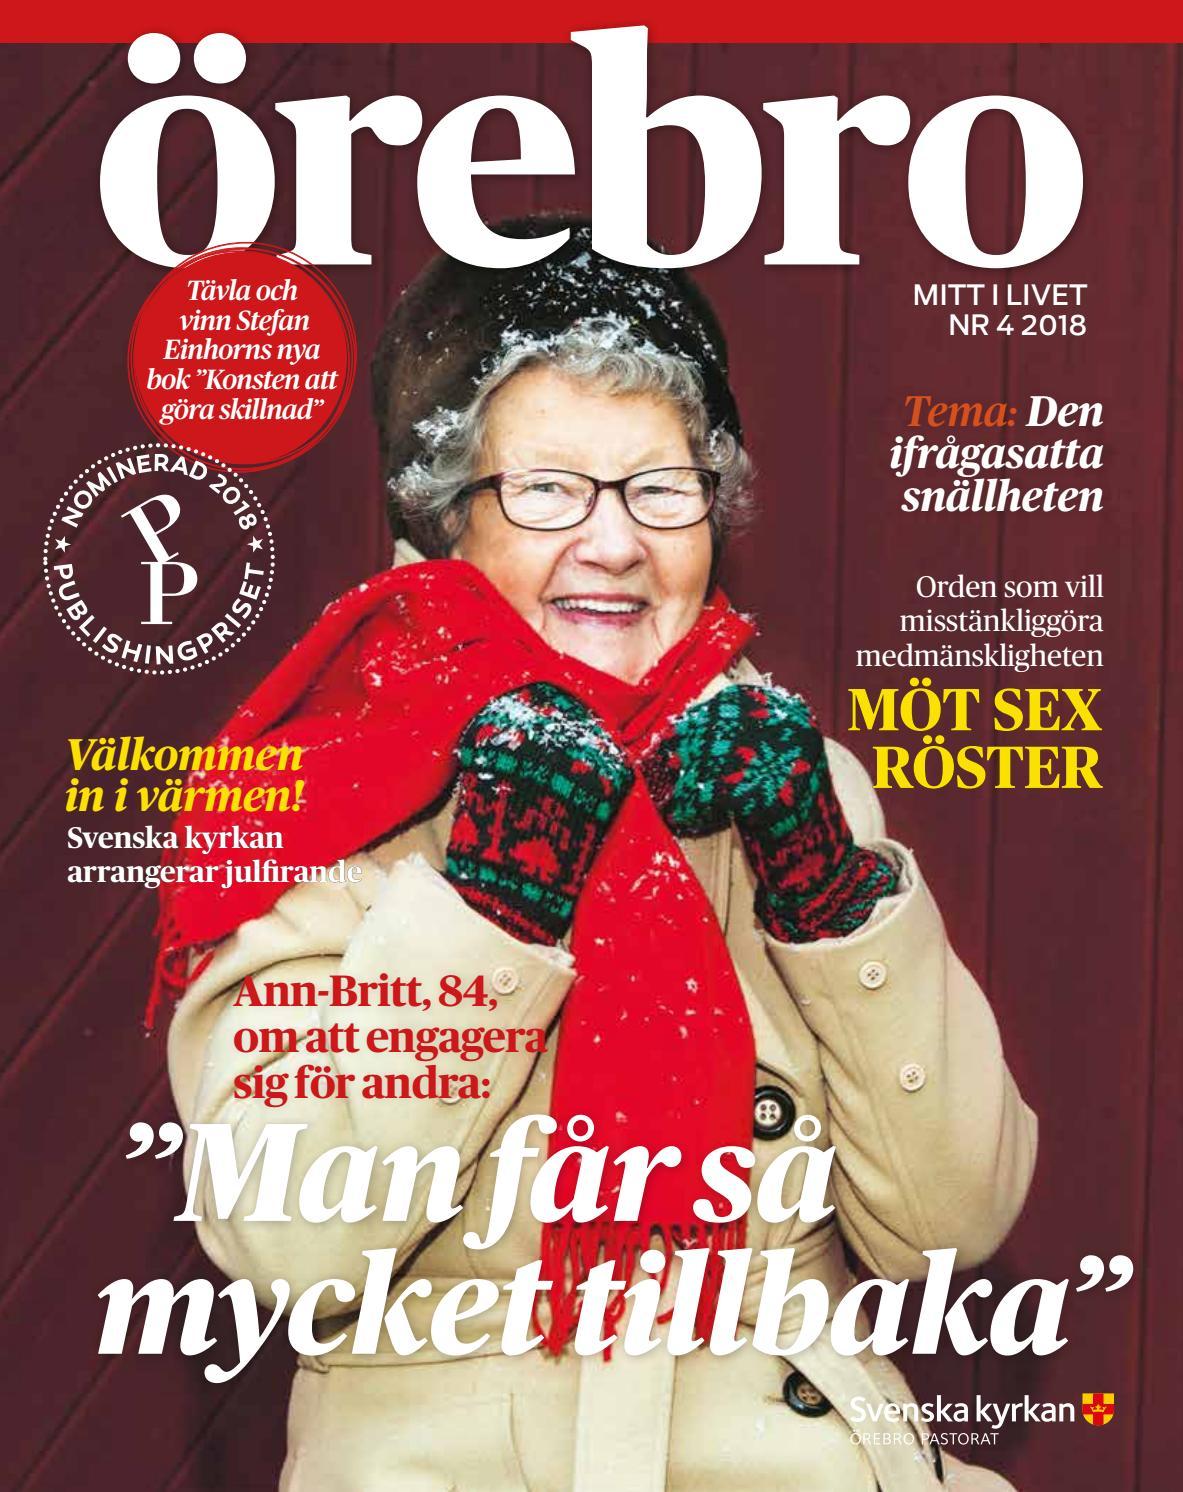 Svenska kyrkan fortstter samarbetet med KIF rebro